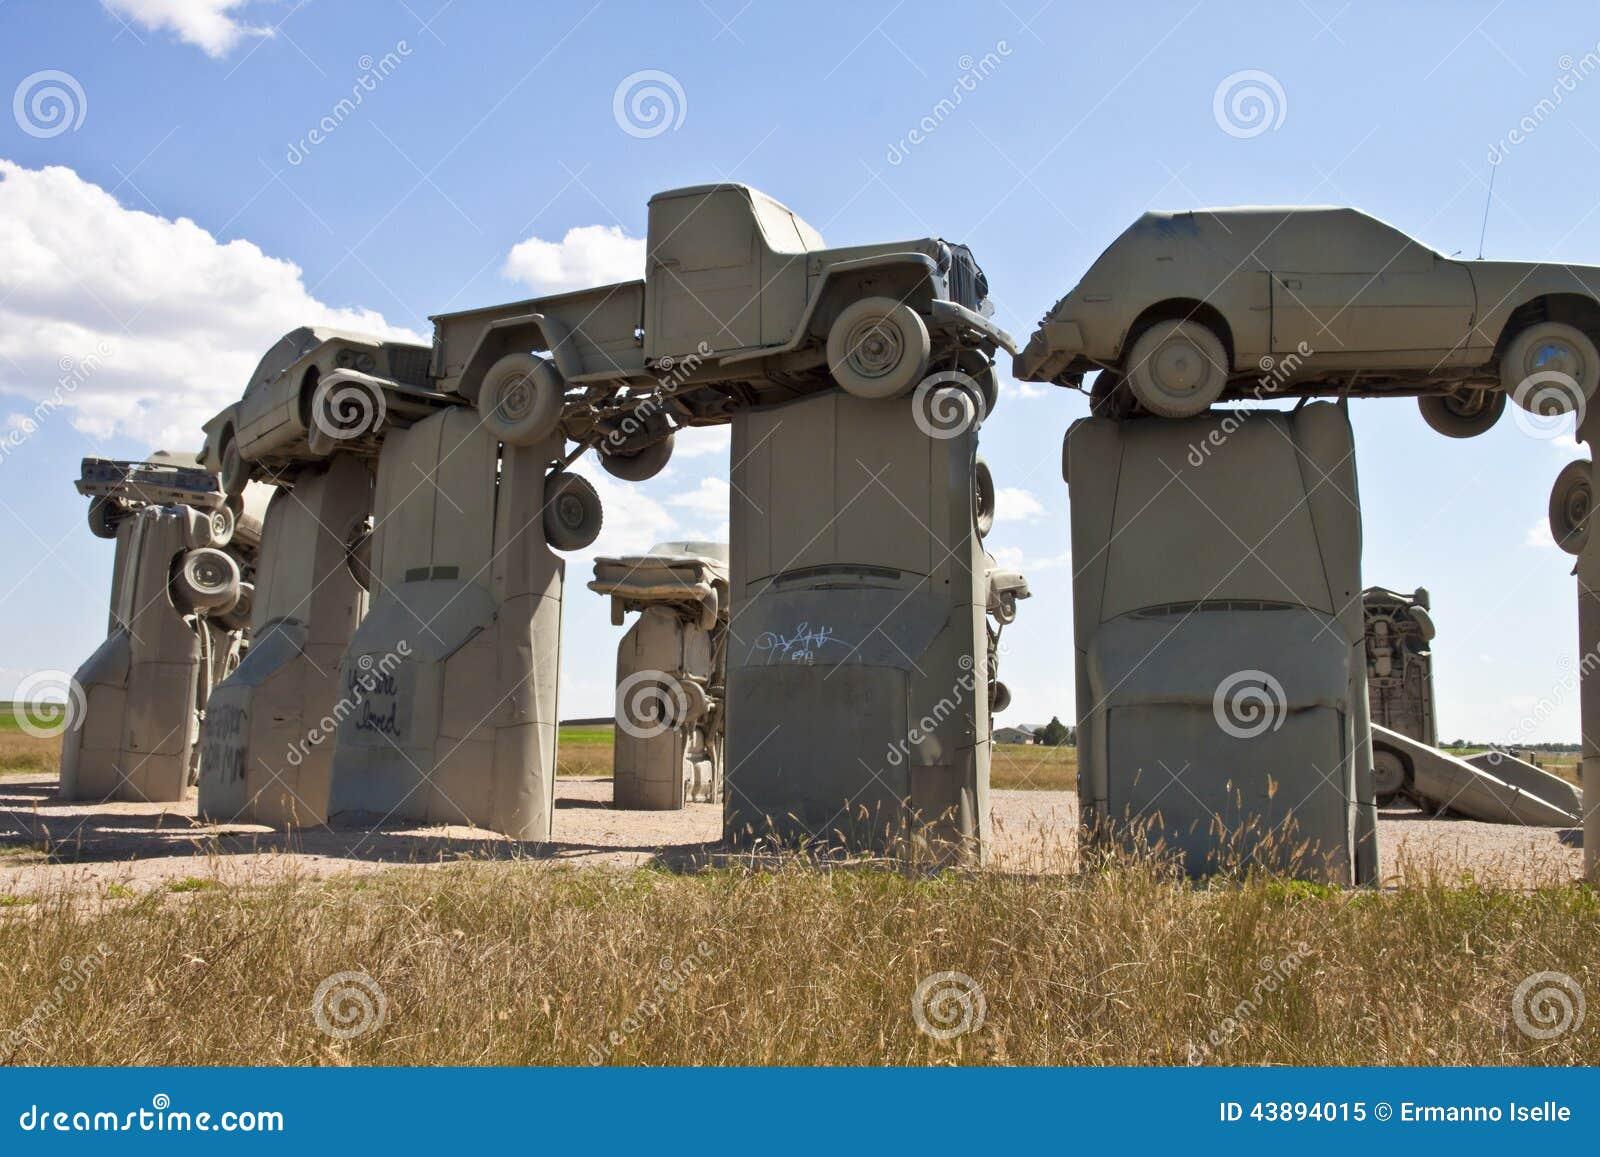 Carhenge,内布拉斯加美国